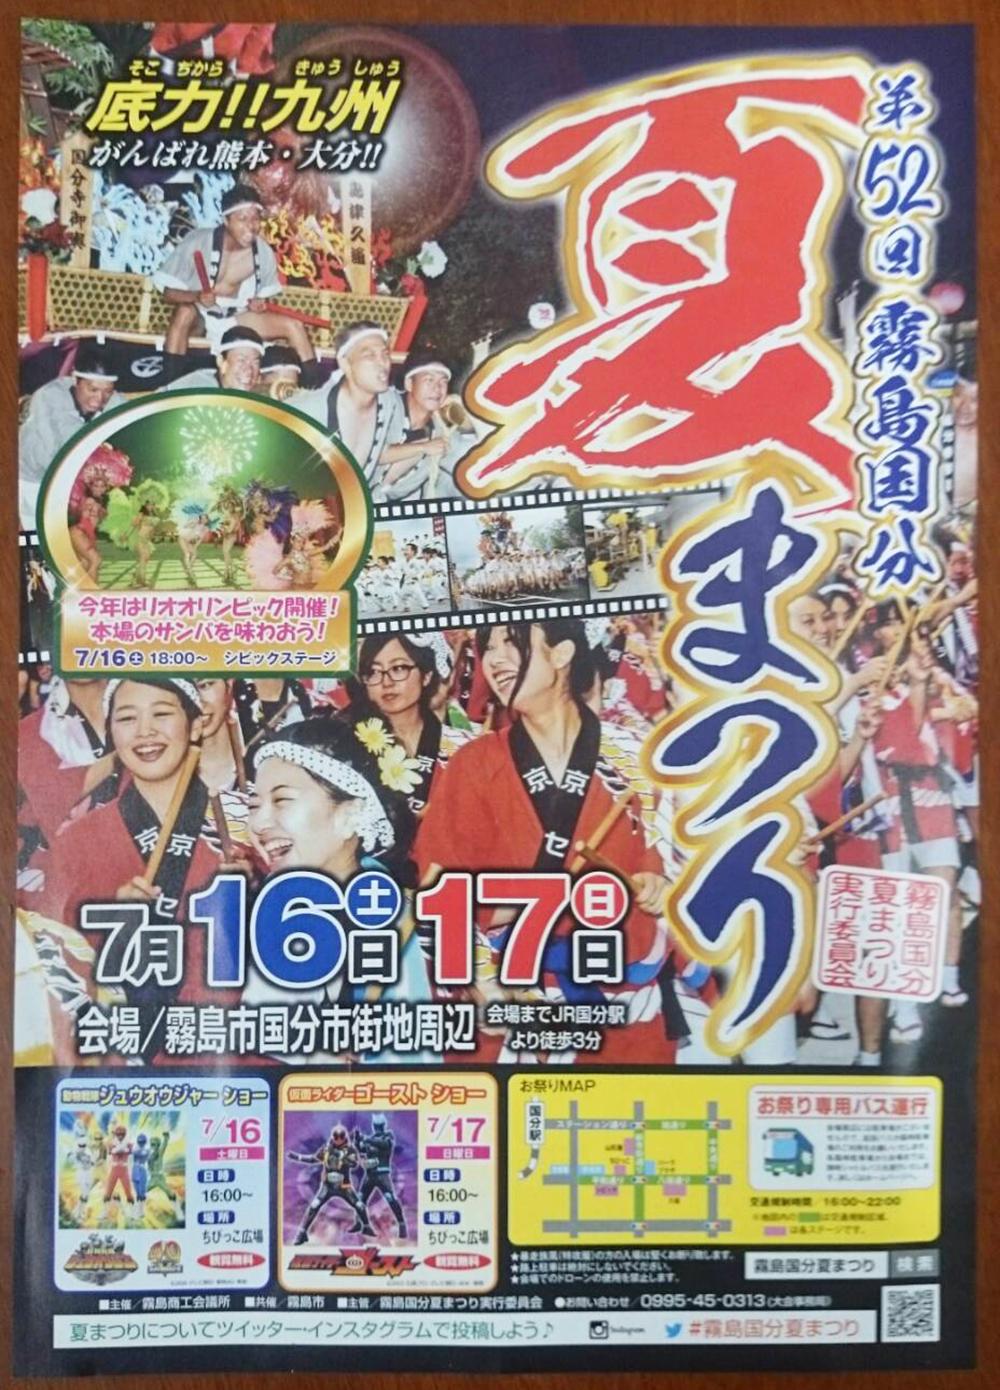 第52回 霧島国分 夏祭り